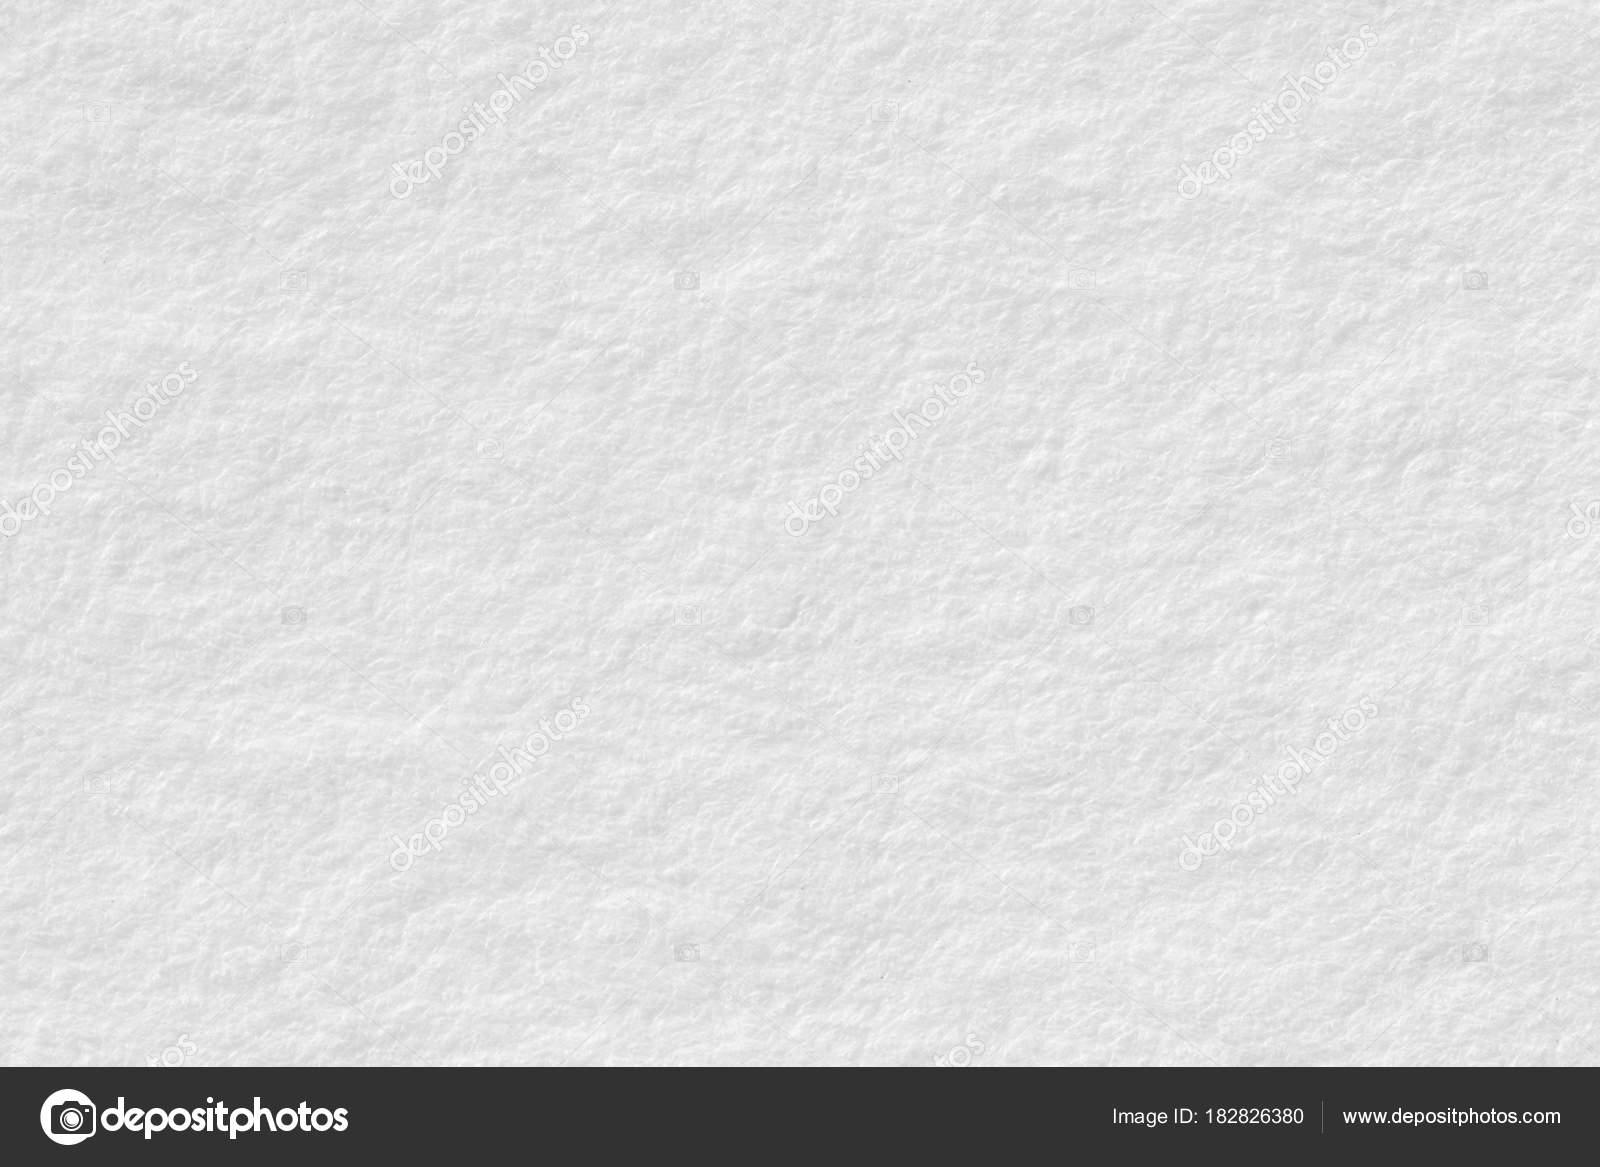 Trama Di Sfondo Bianco Carta Fatta A Mano Foto Stock Yamabikay